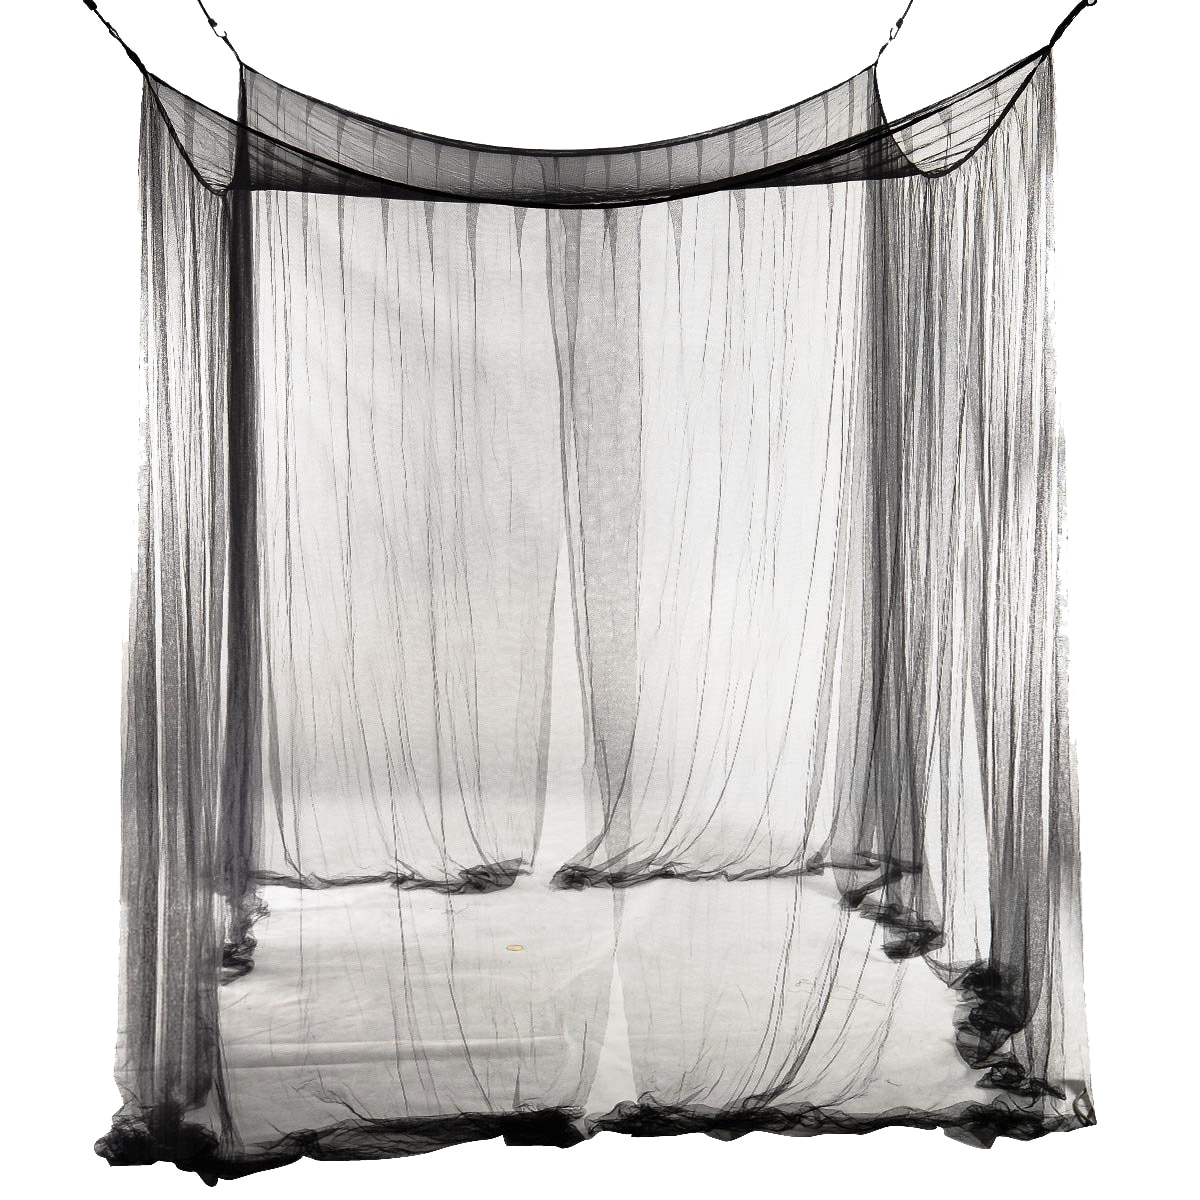 Gran Casa práctica mosquiteros negro cuatro poste esquina cama dosel mosquitero red para acampar